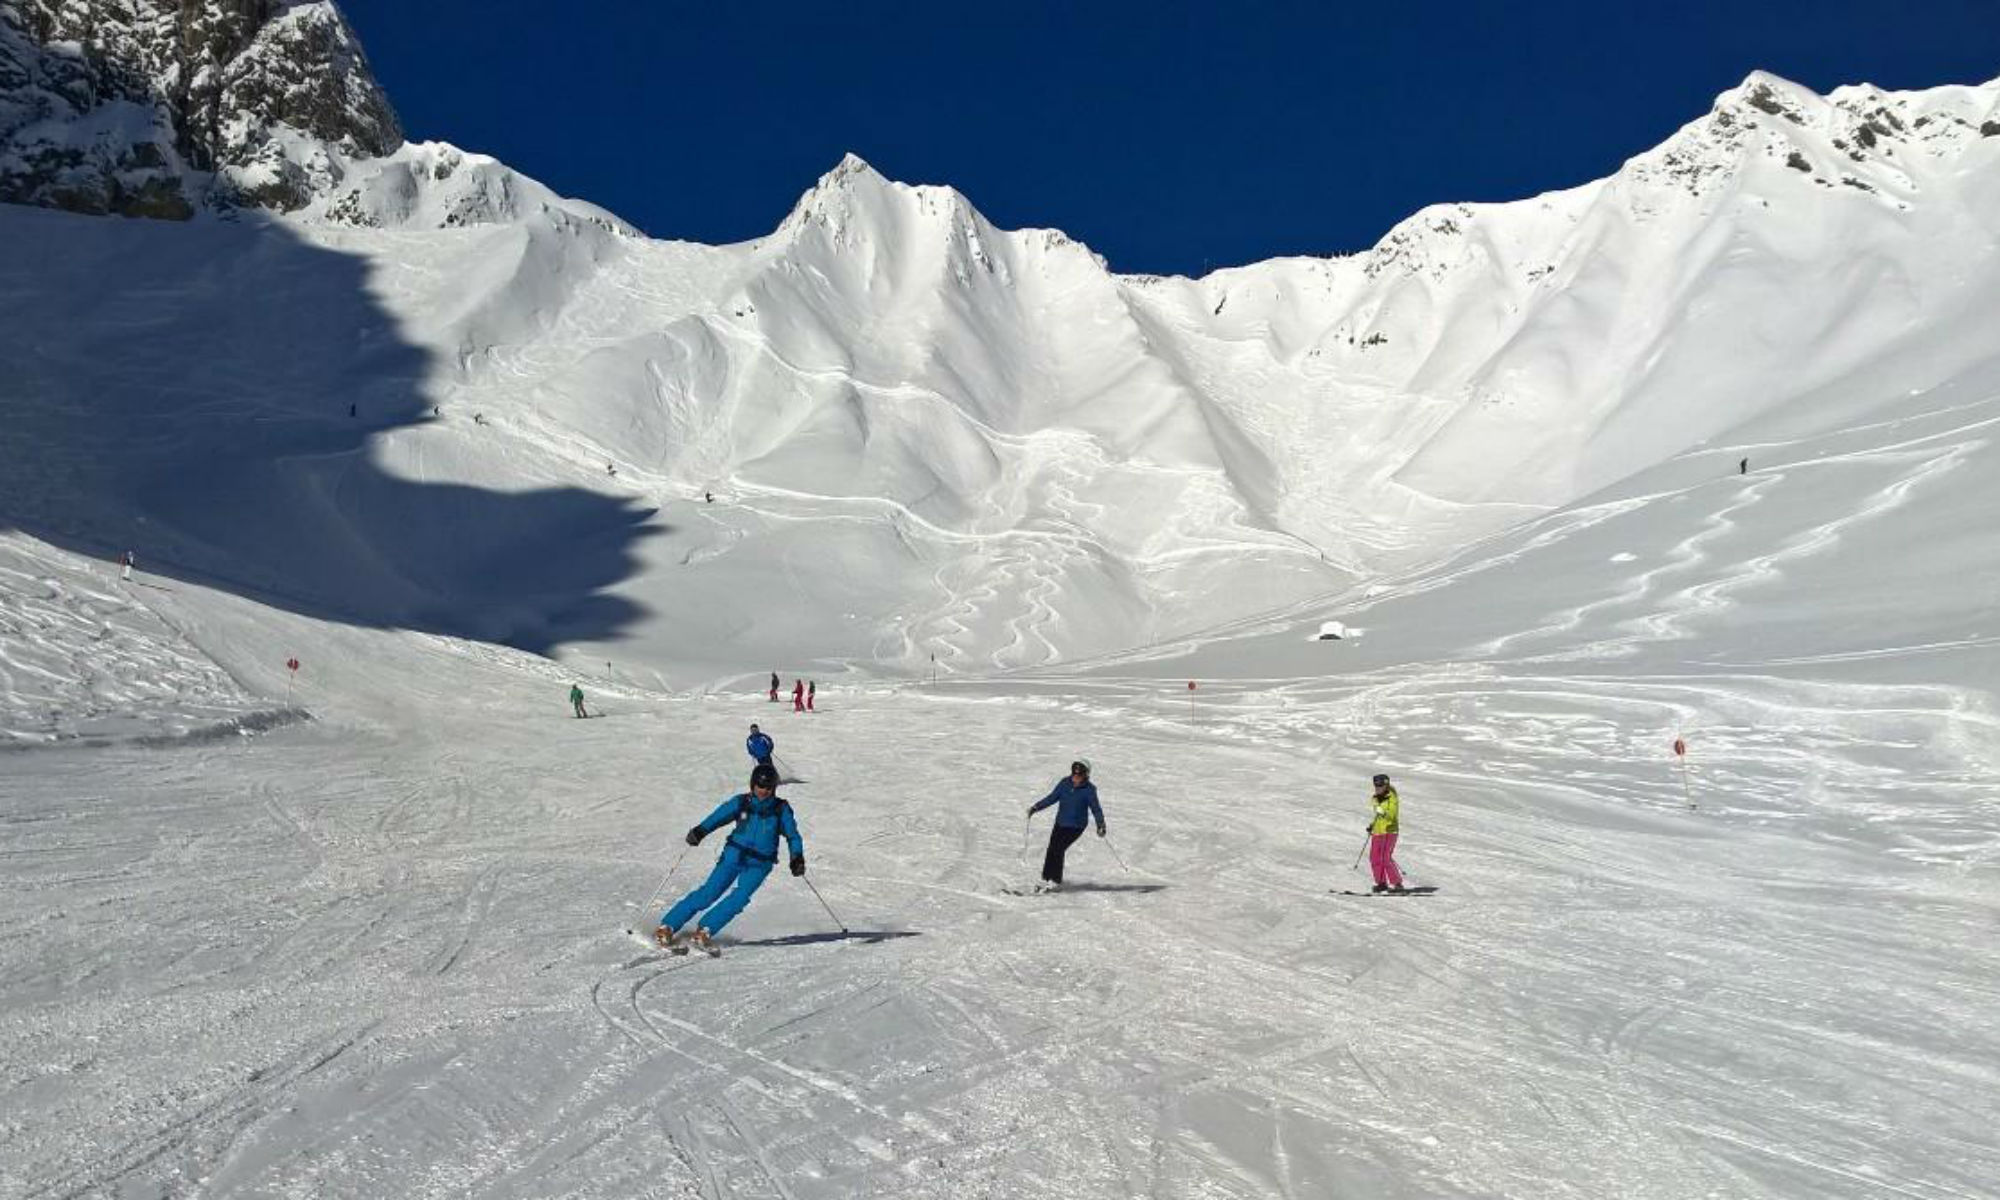 3 skiers on a beginner friendly slope in the ski resort of St Anton.